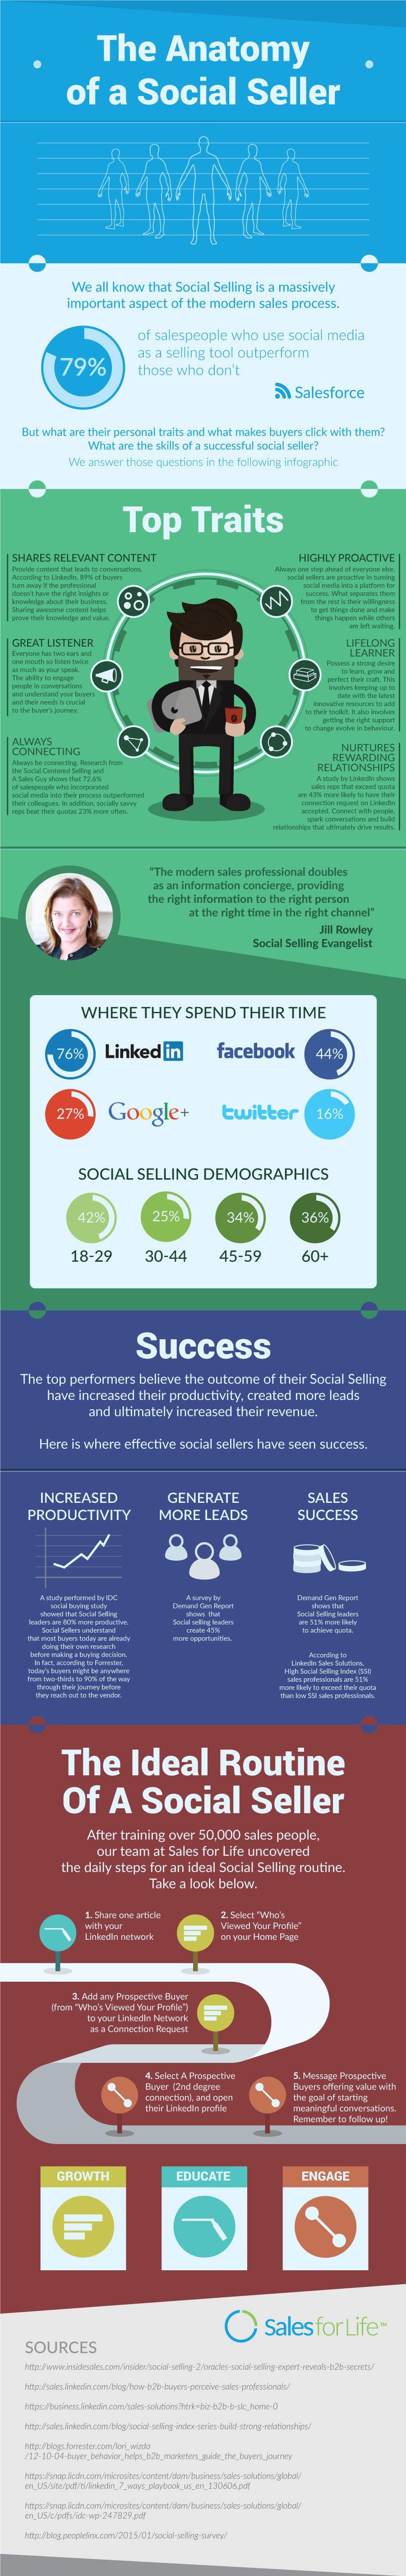 Konkurrenceindlæg #                                        20                                      for                                         Infographic about Social Selling Skills & Process: Flat Design